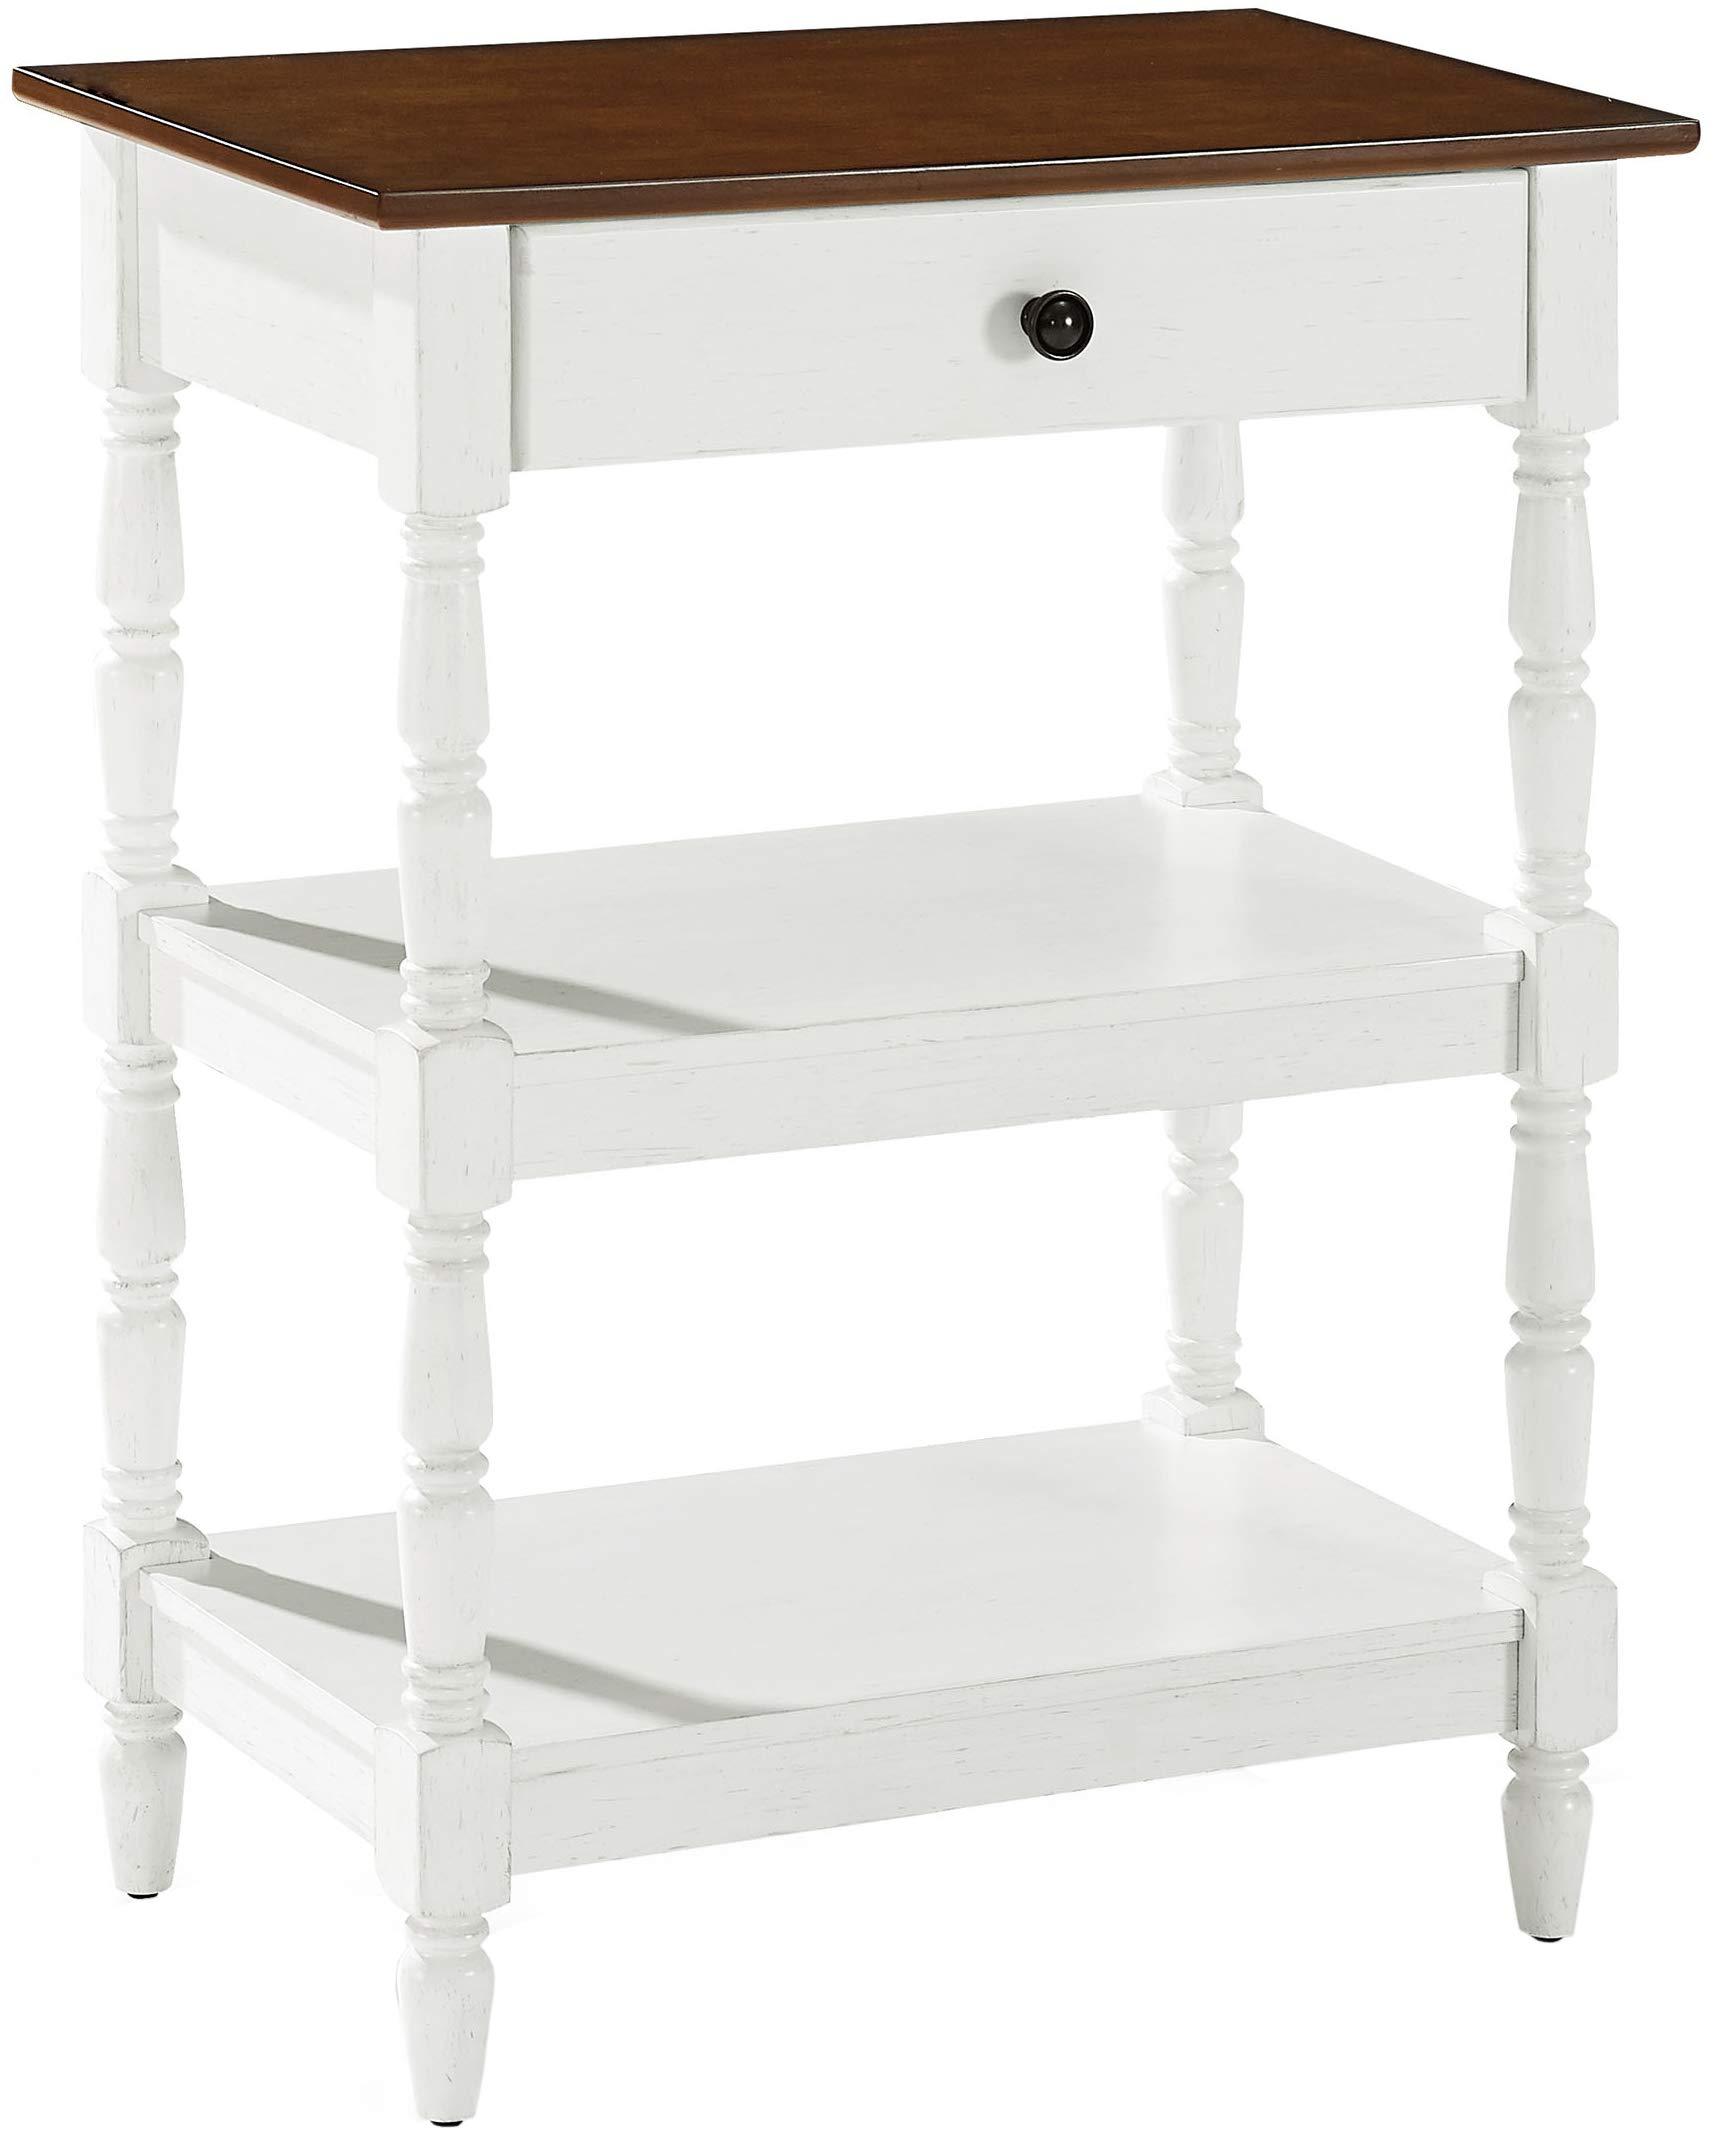 Crosley Furniture Heidi Rustic Accent Table, Distressed White